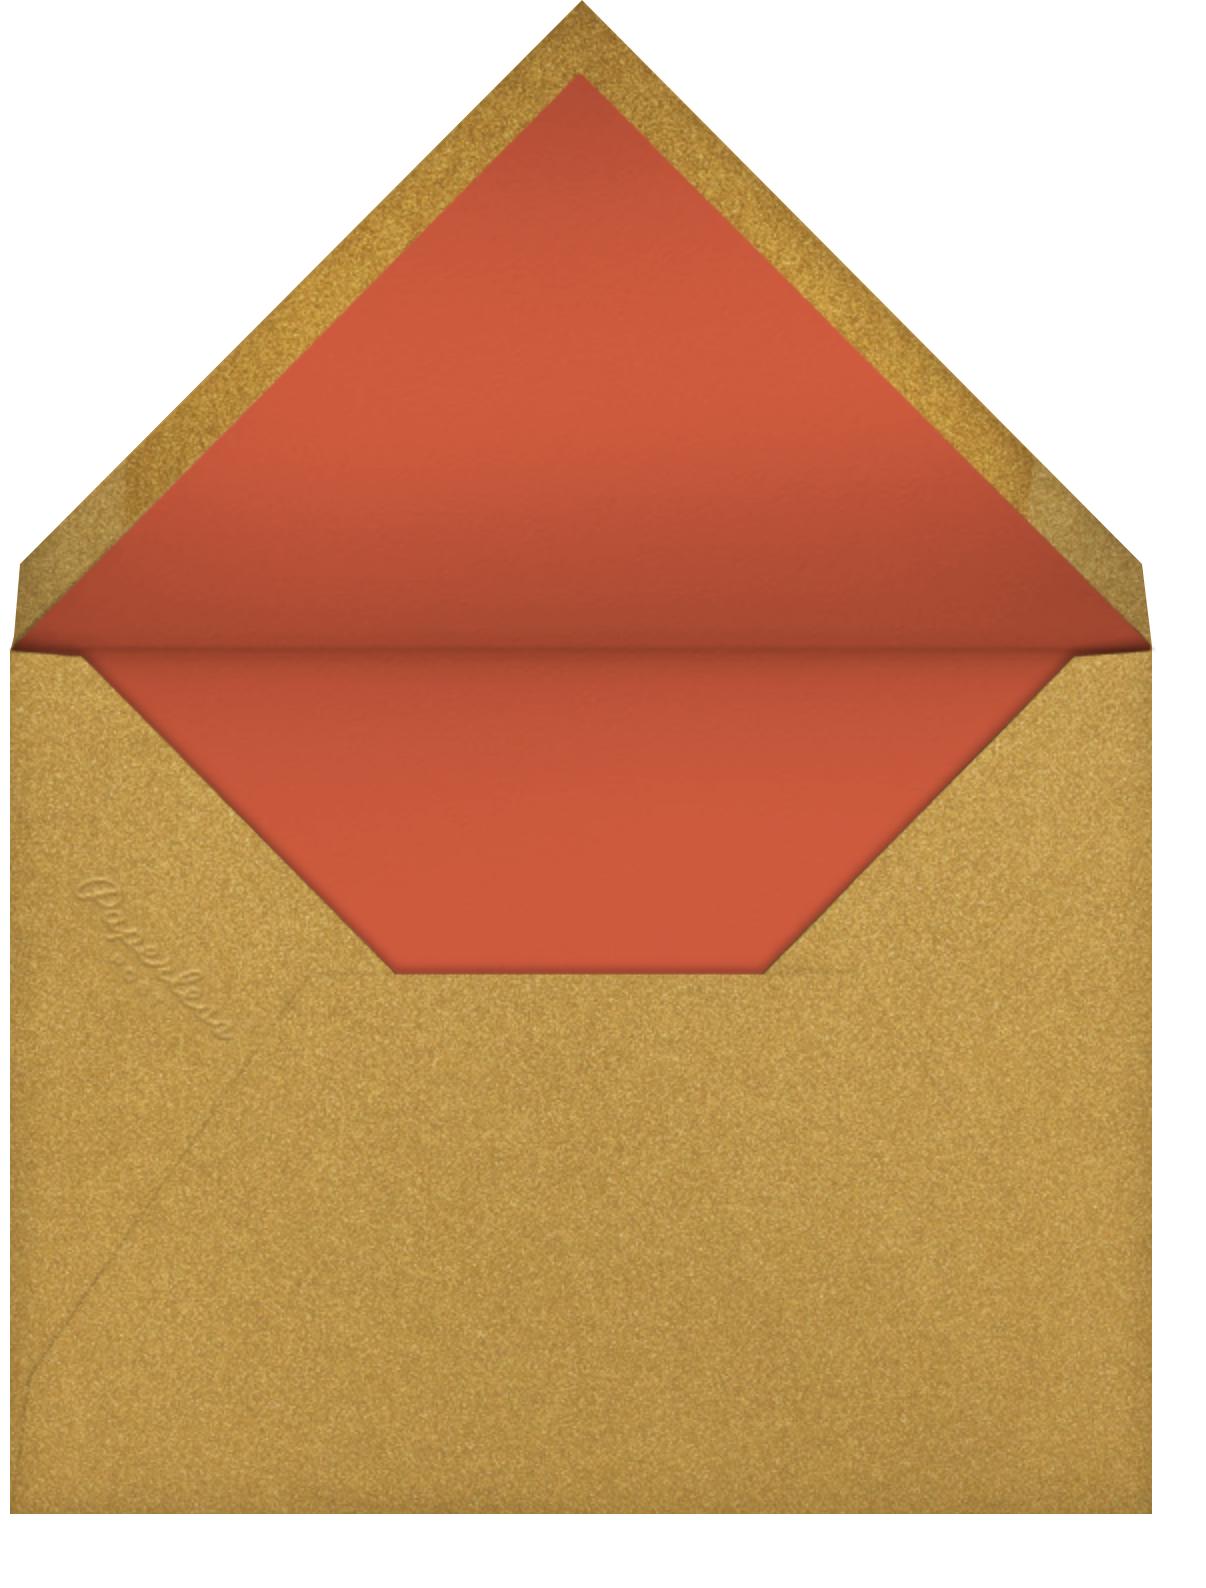 Cherry Blossom Ox (Greeting) - Paperless Post - Envelope